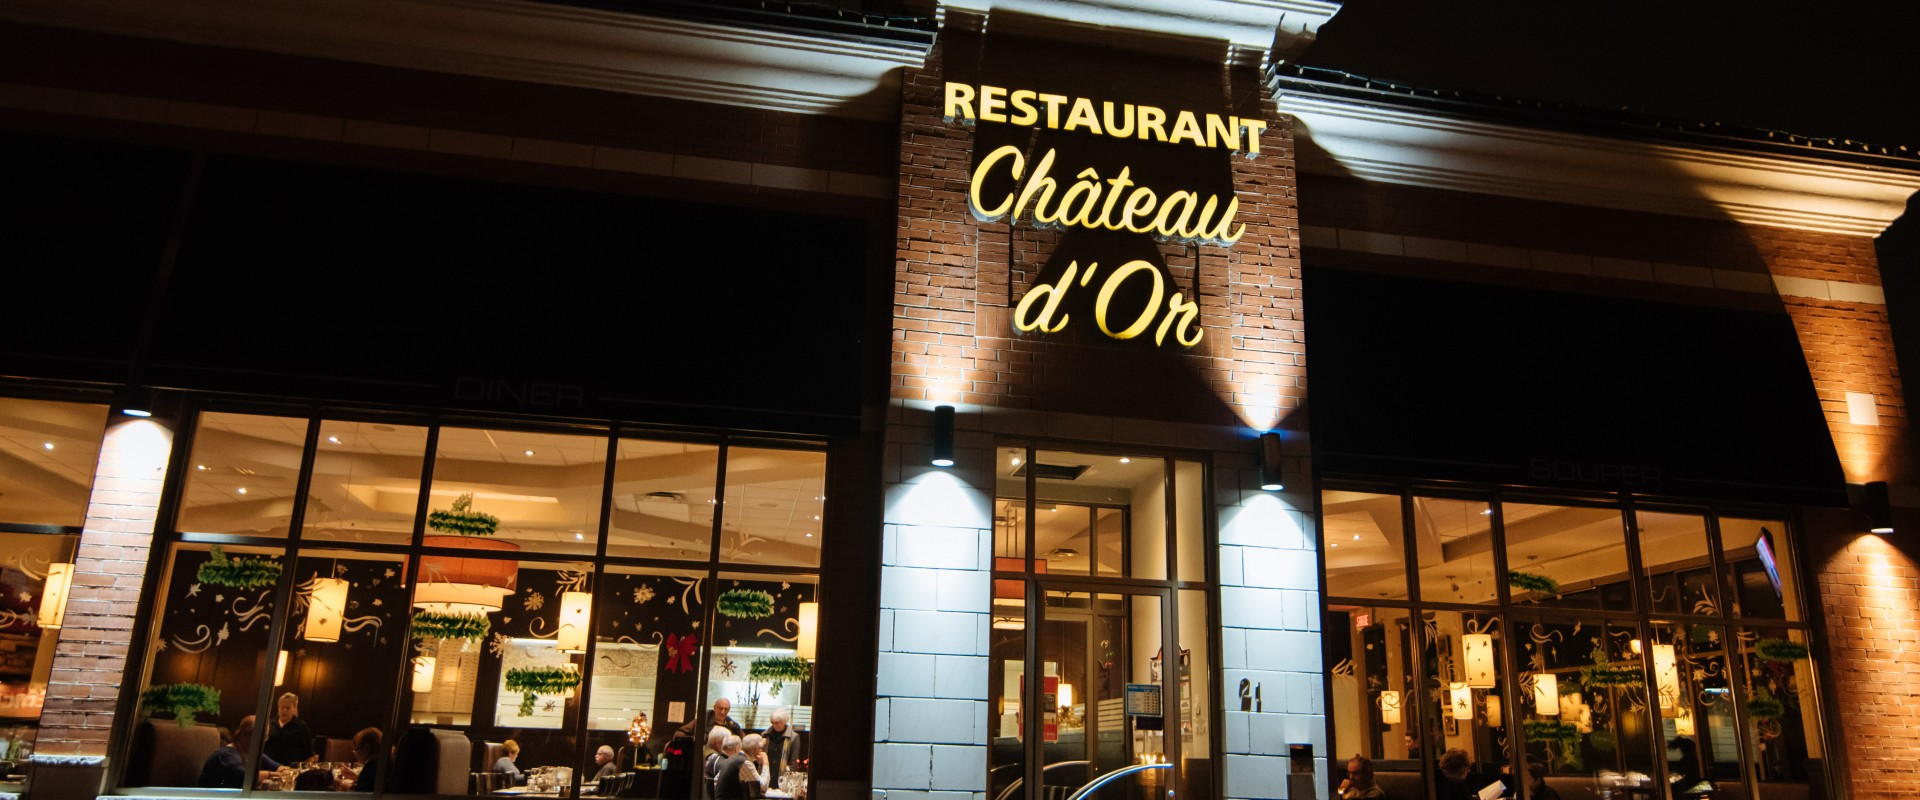 Home Chateau Dor Photos 11 En